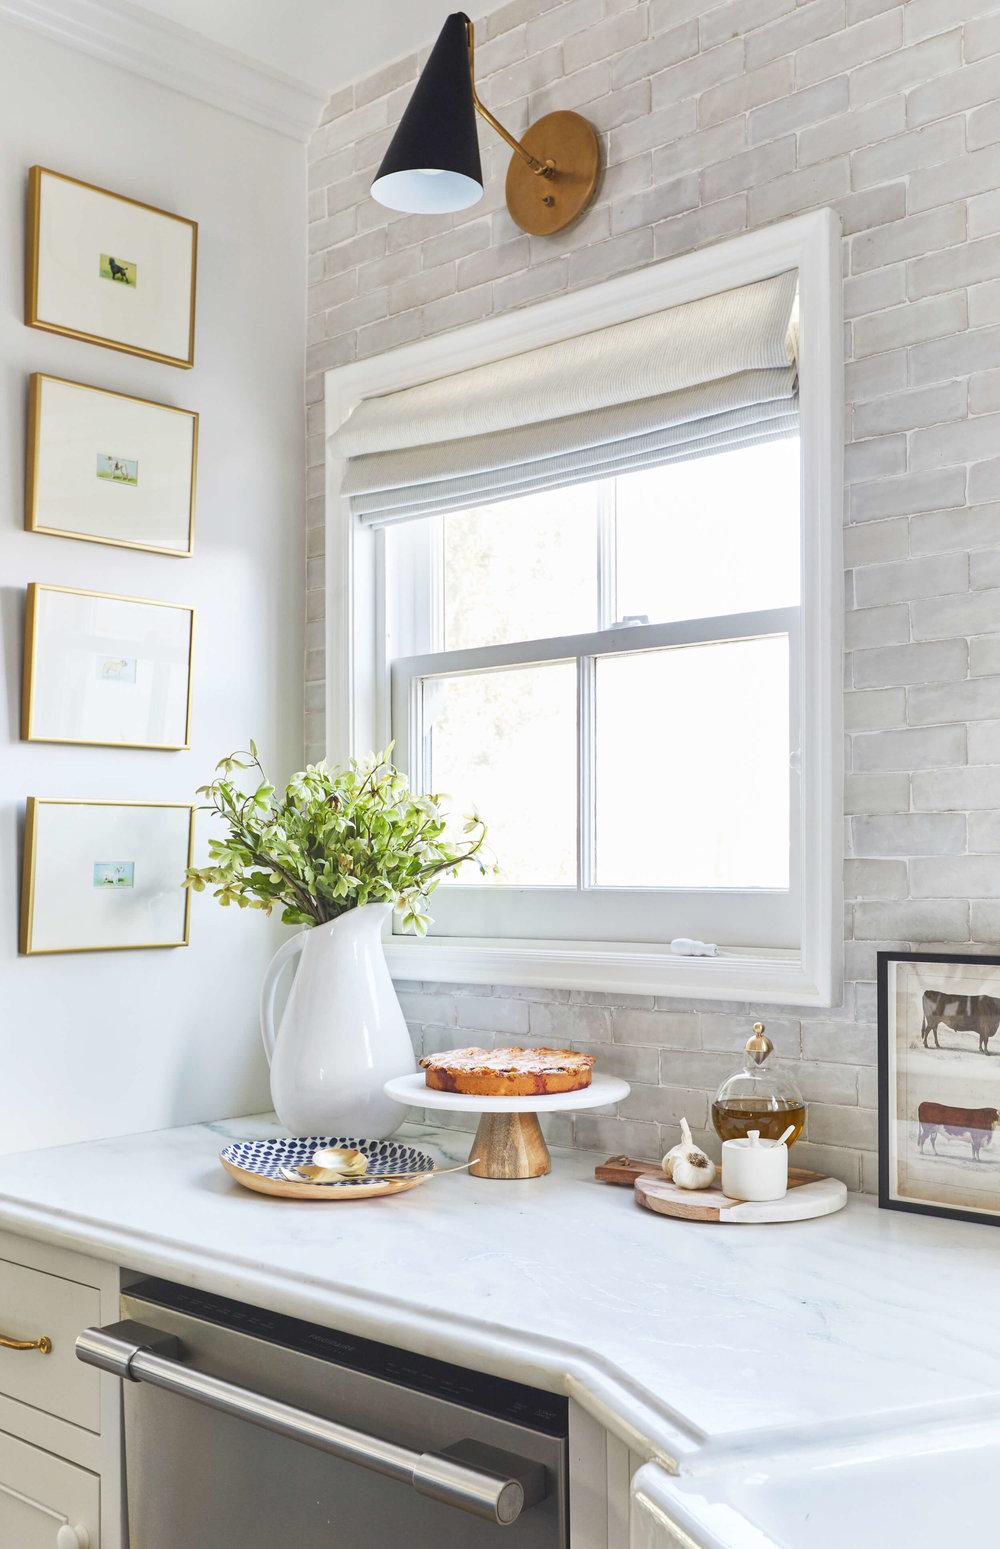 Emily-Henderson_Modern-English-Cottage_Tudor_Kitchen_Dining-Room_Reveal_3-EDITED.jpg